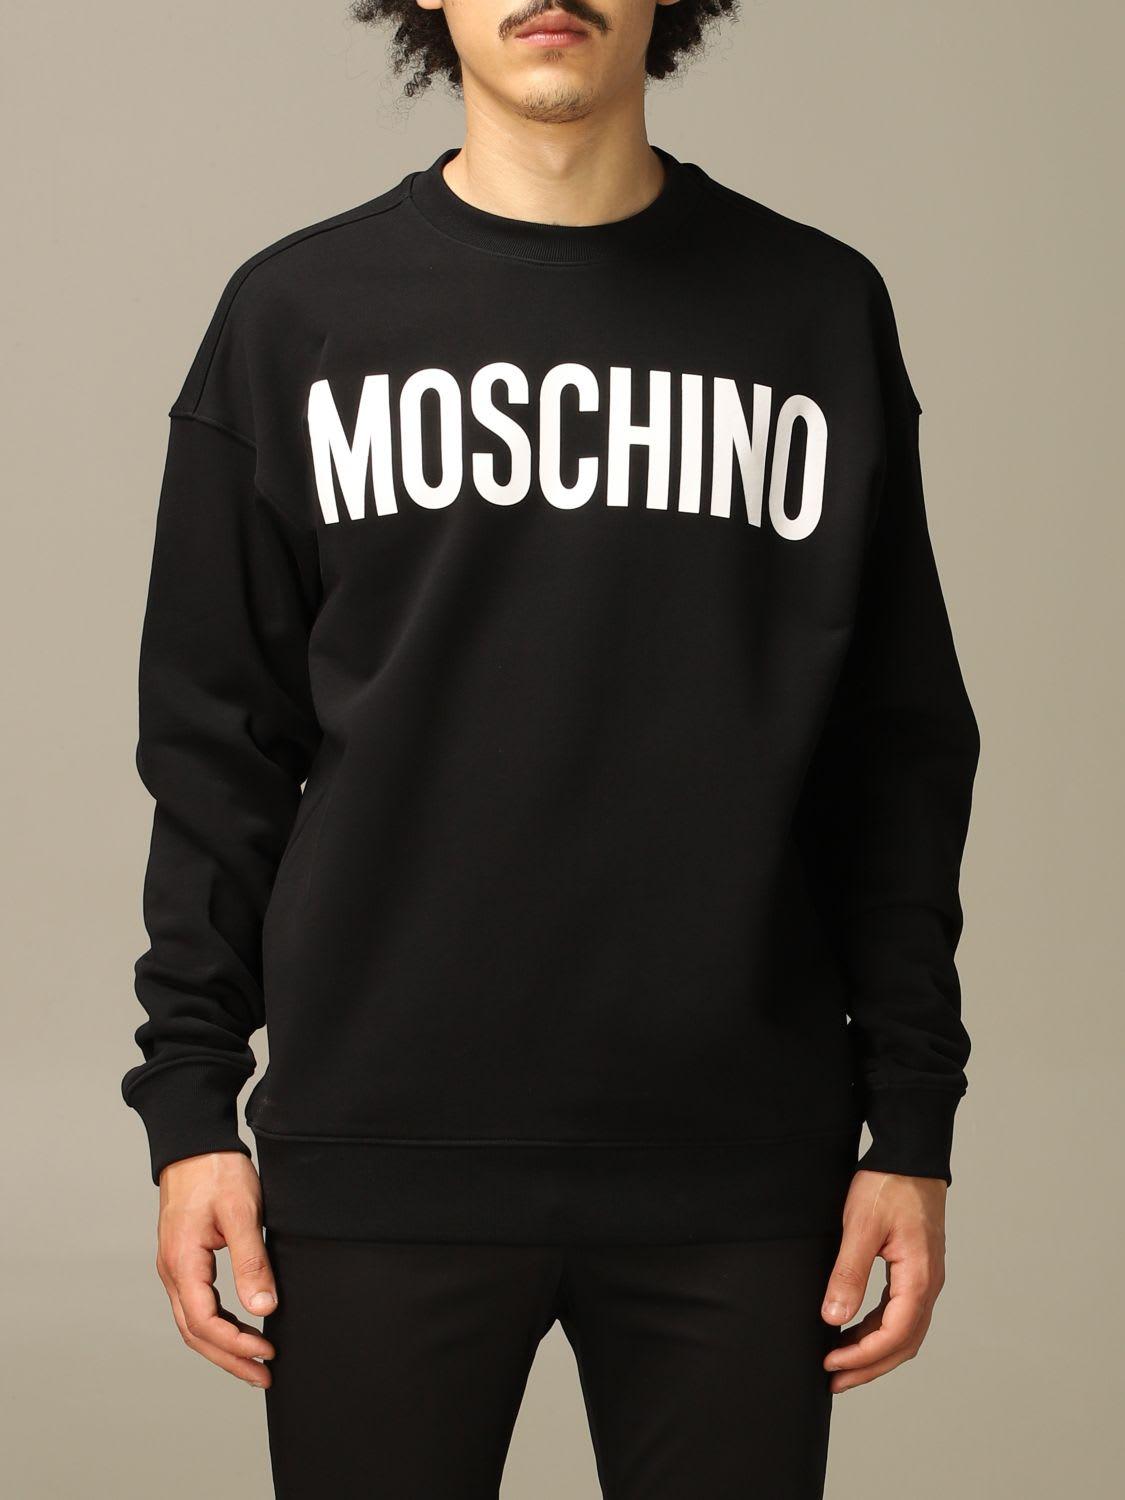 Moschino Couture Sweatshirt Moschino Couture Crewneck Sweatshirt With Mirror Print